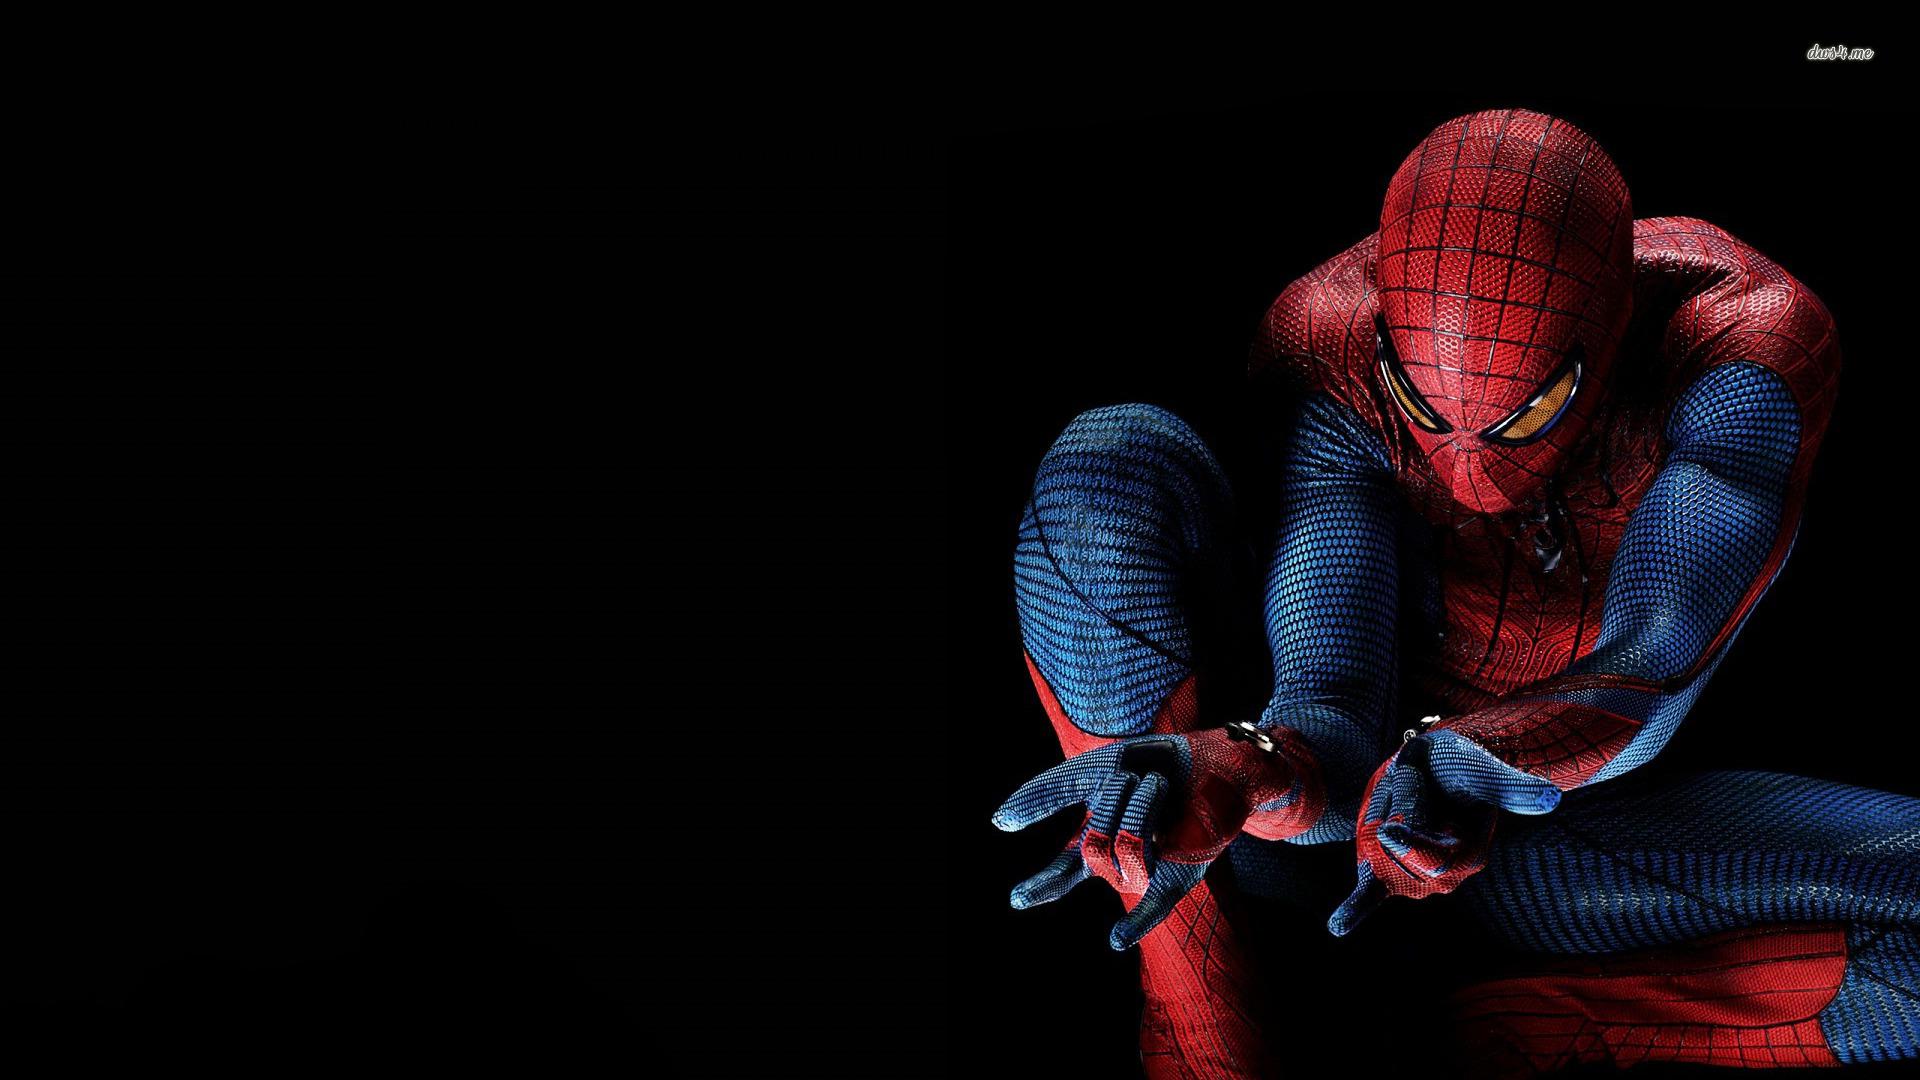 Movies Spider man Andrew Garfield The Amazing Spider Man Peter Parker 1920x1080